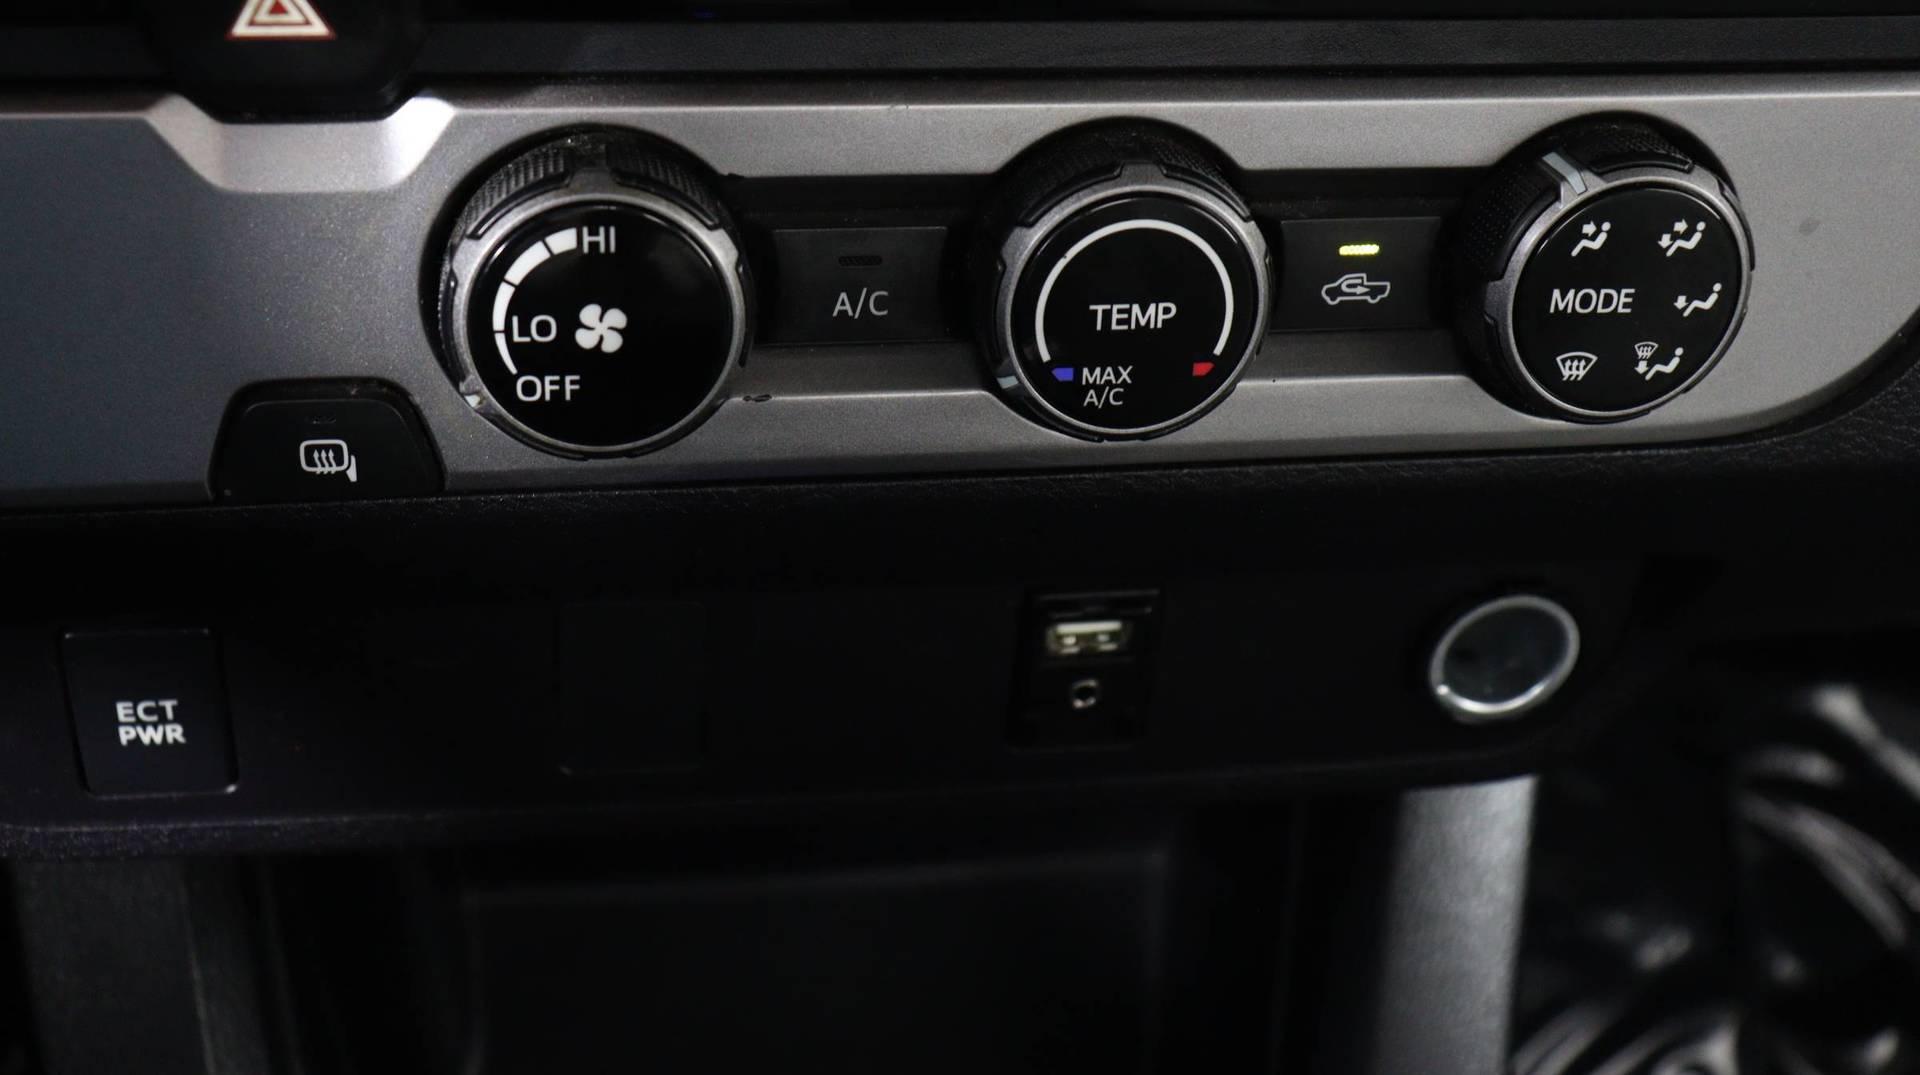 Carvix - Used vehicle - Truck TOYOTA TACOMA 2017